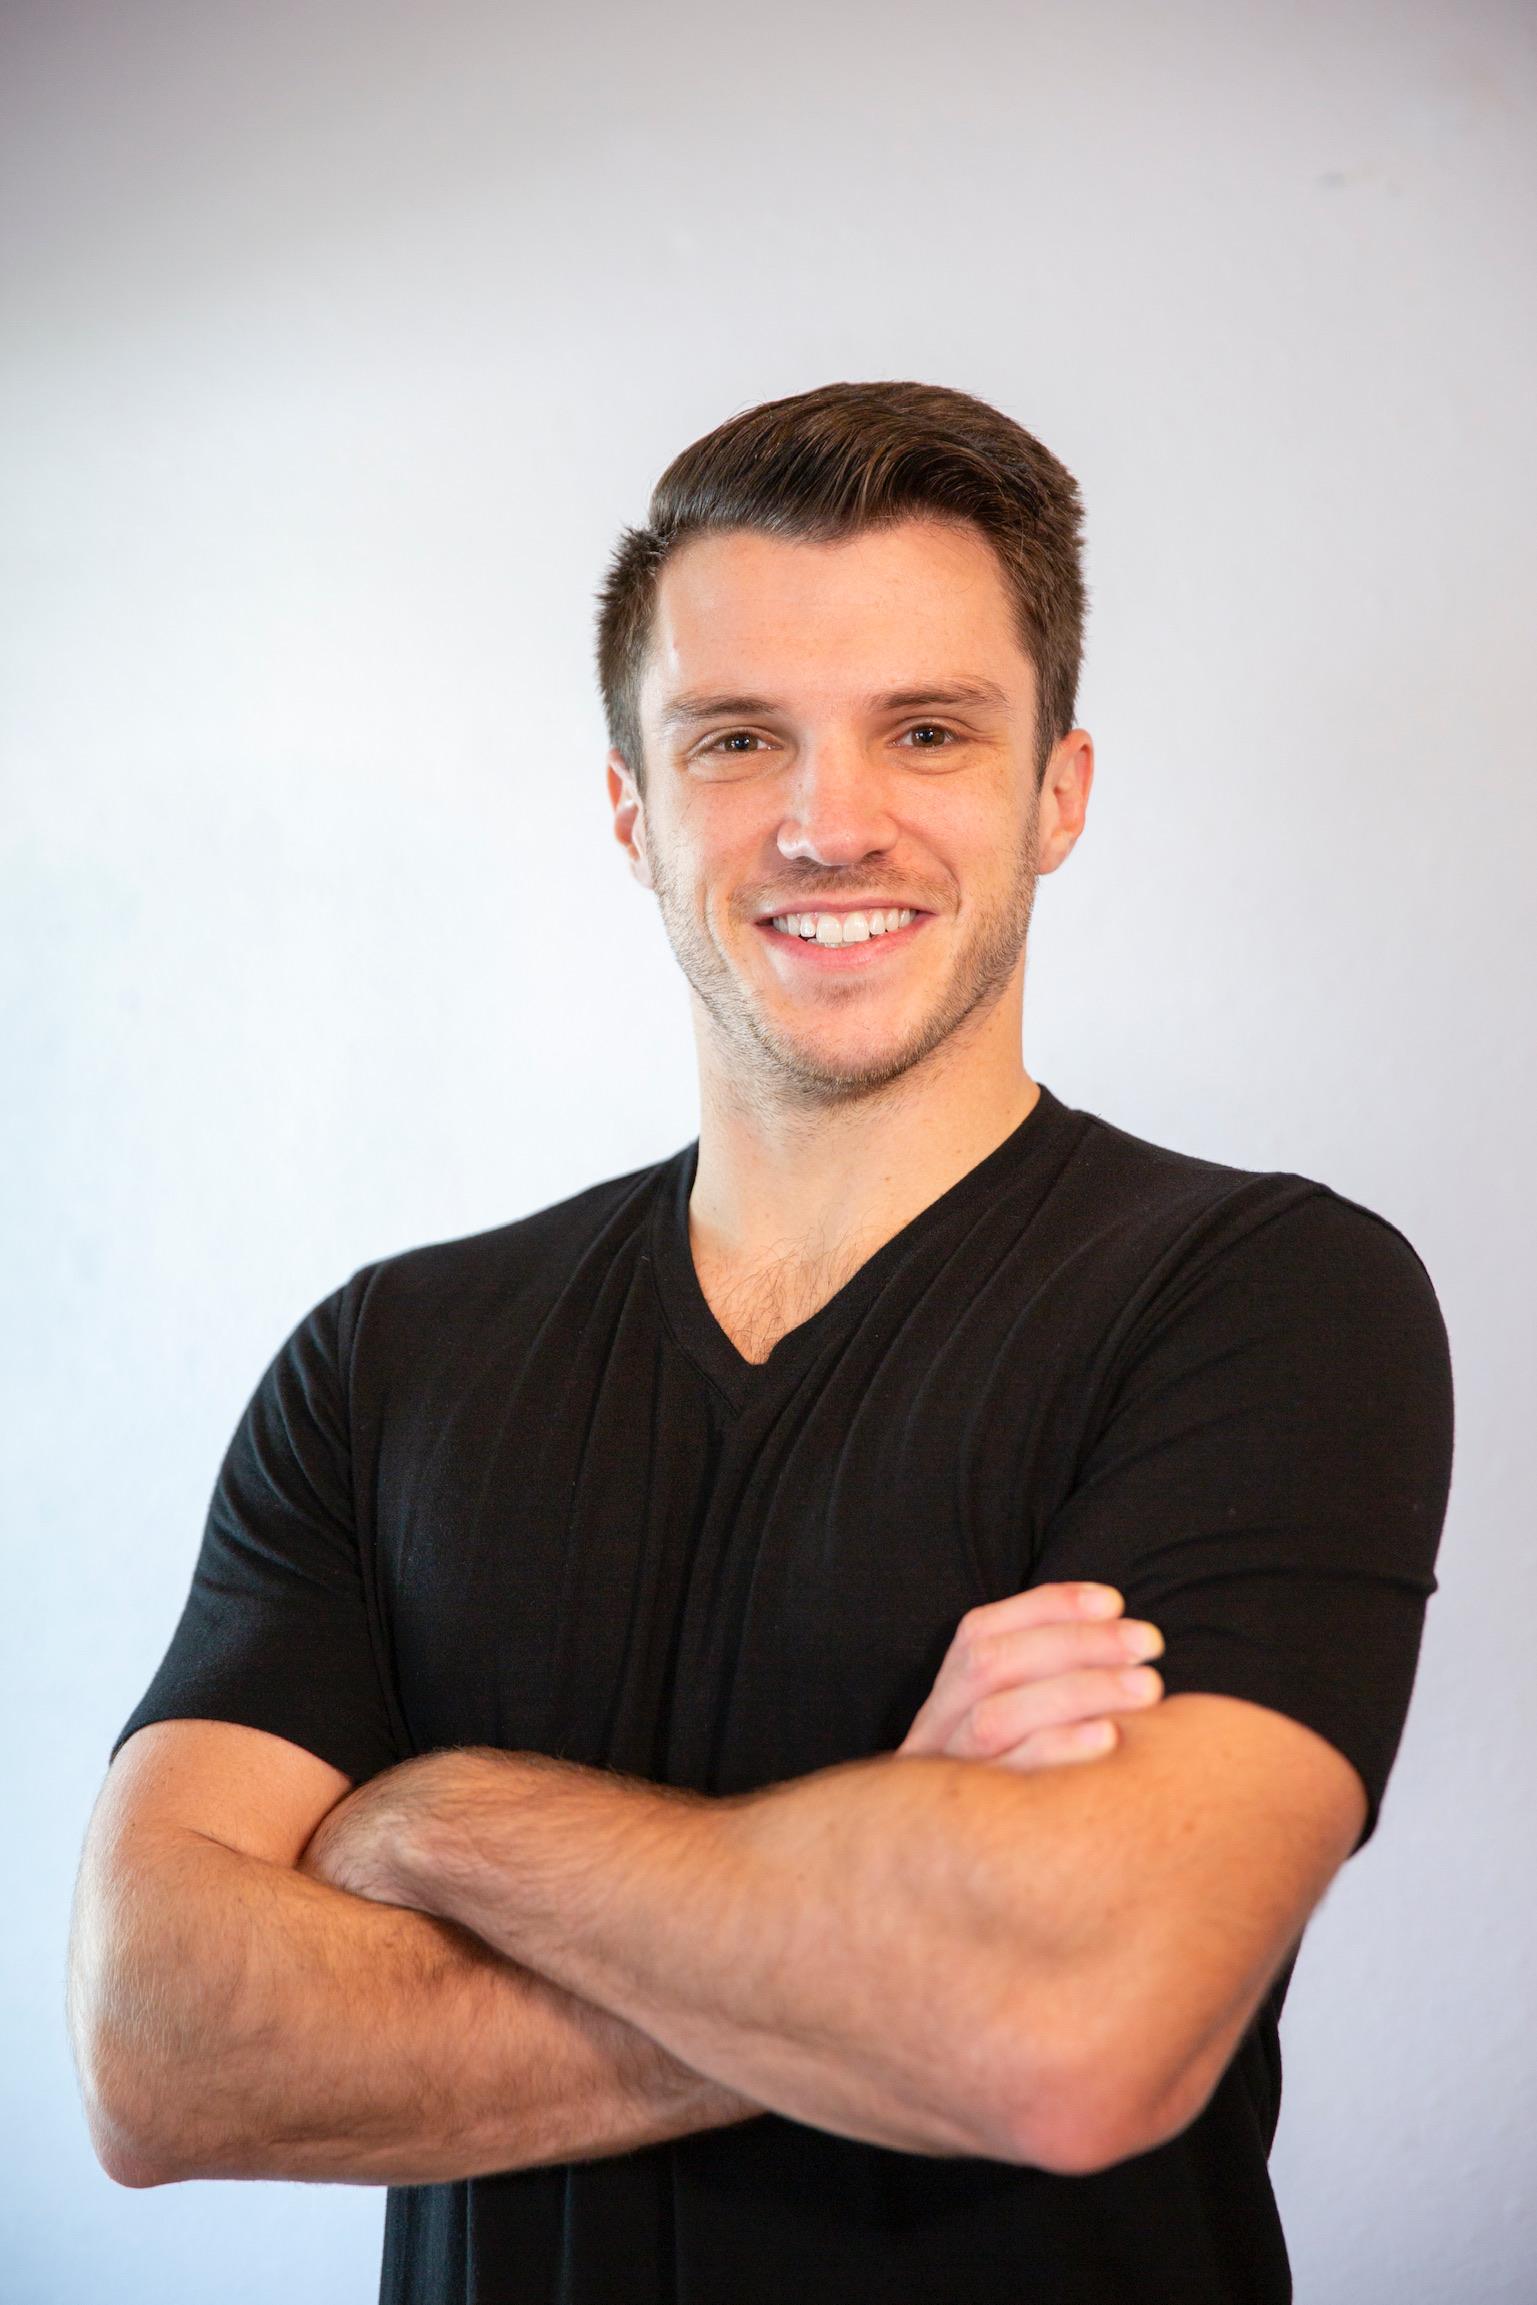 Topmarq Founder, Quinn Osha